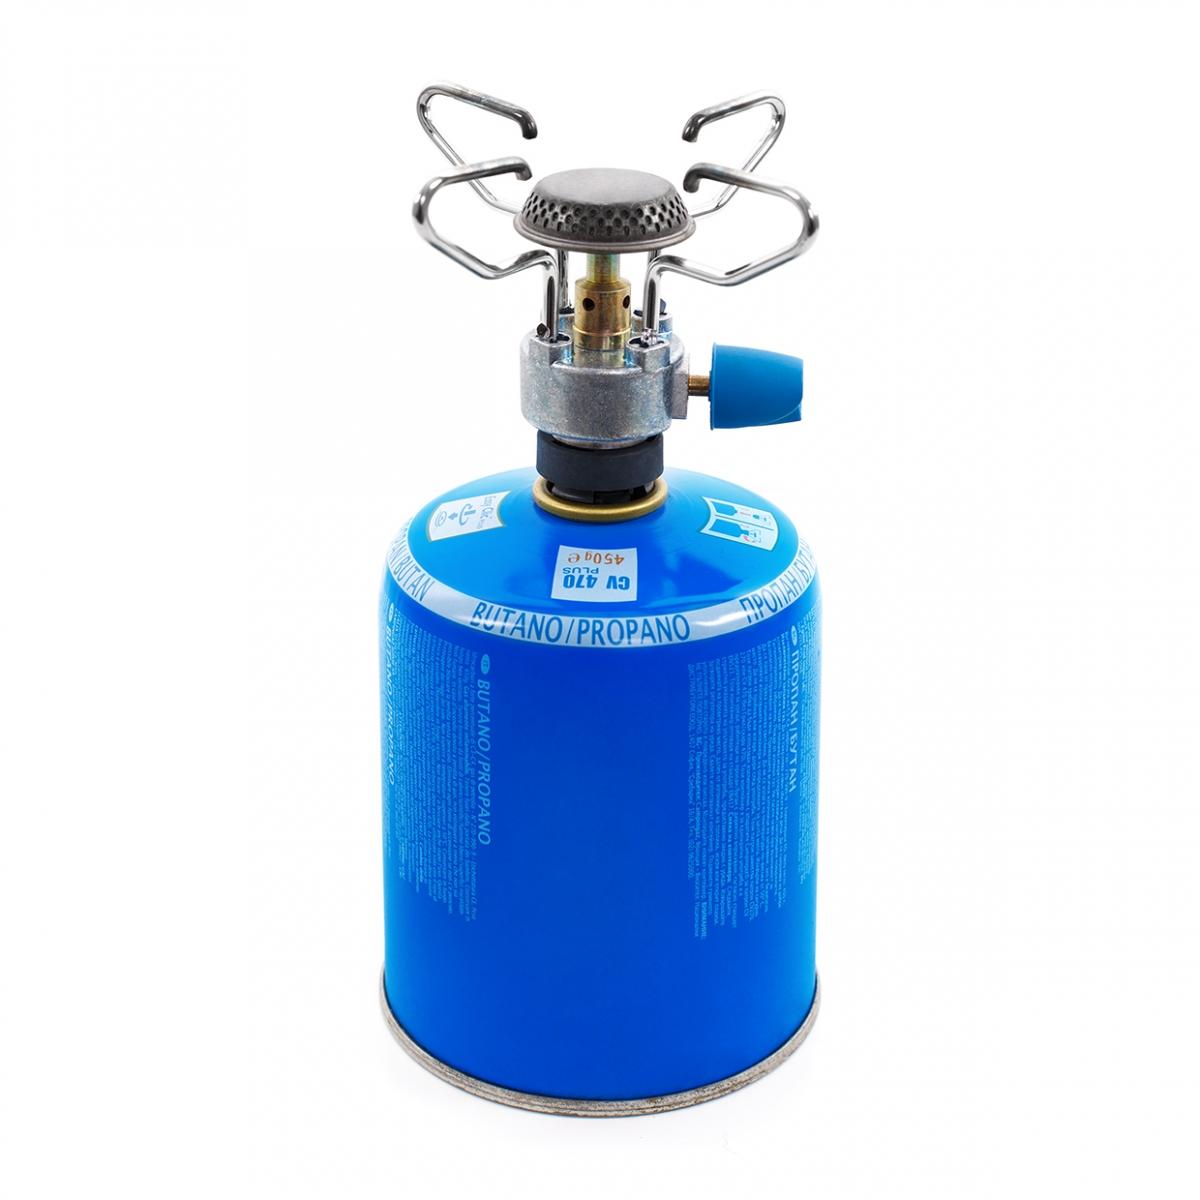 Imagen en la que se ve un hornillo de gas